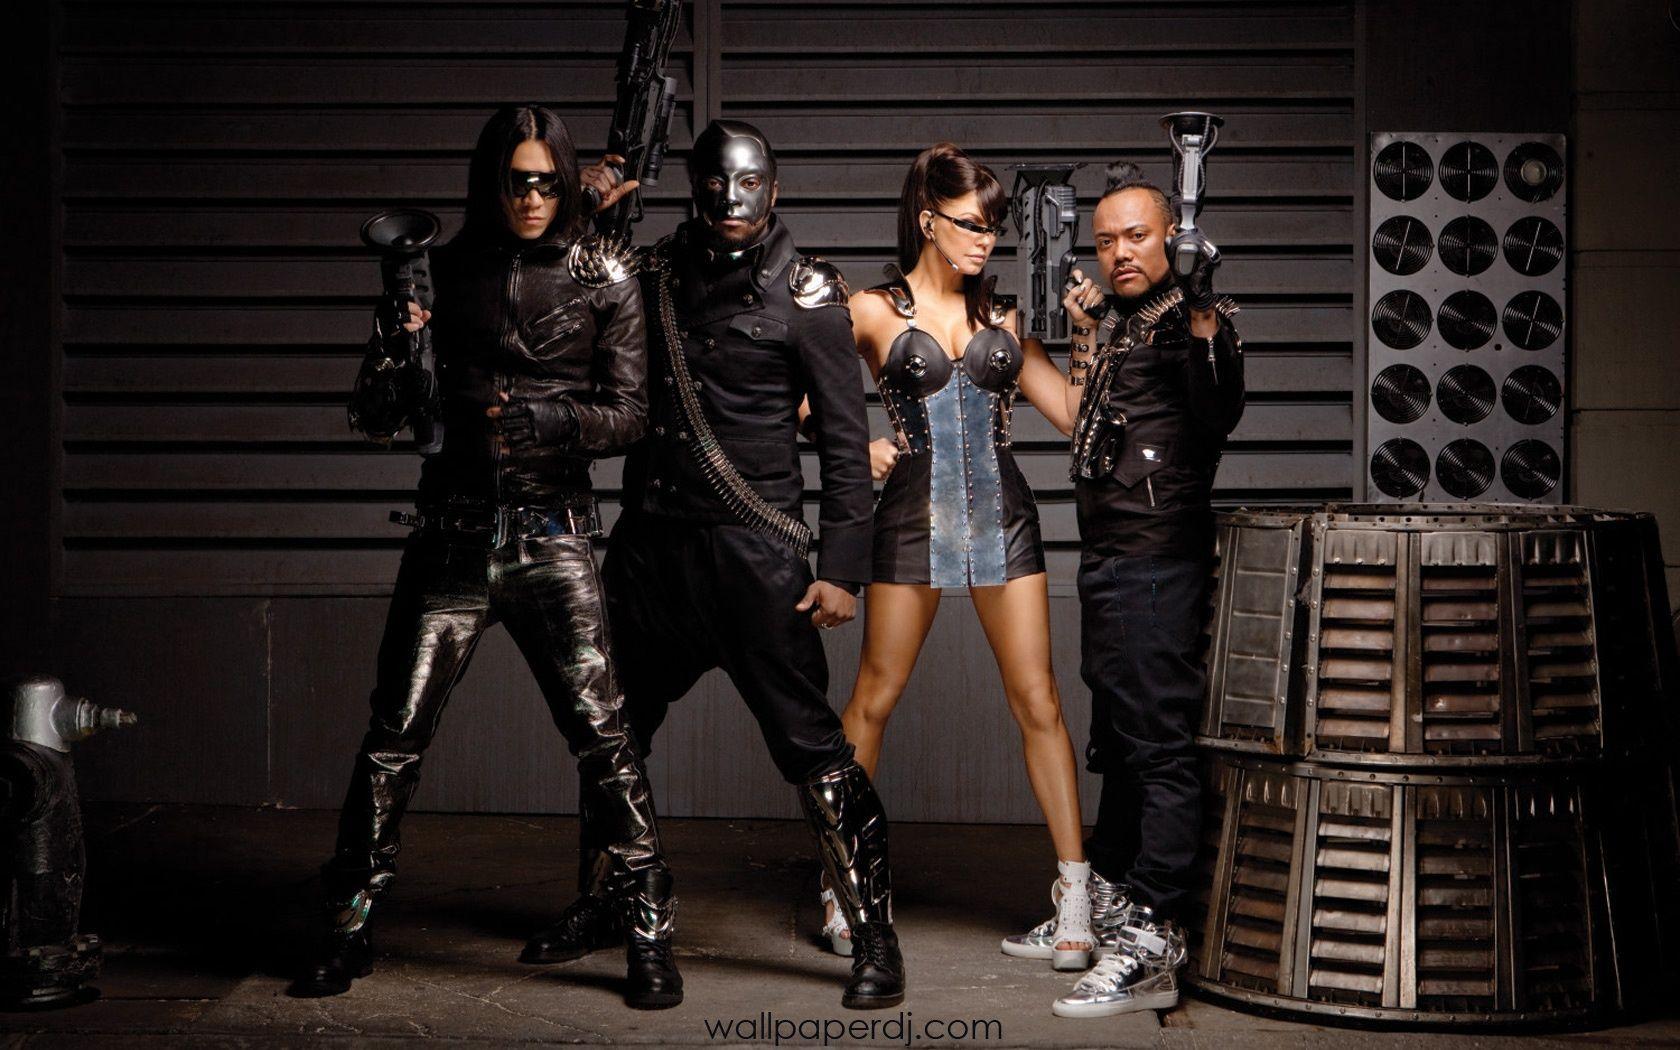 1680x1050 Black Eyed Peas Album Photo Shoot Wallpaper Music And Dance Wallpapers Black Eyed Peas Albums Black Eyed Peas Fergie